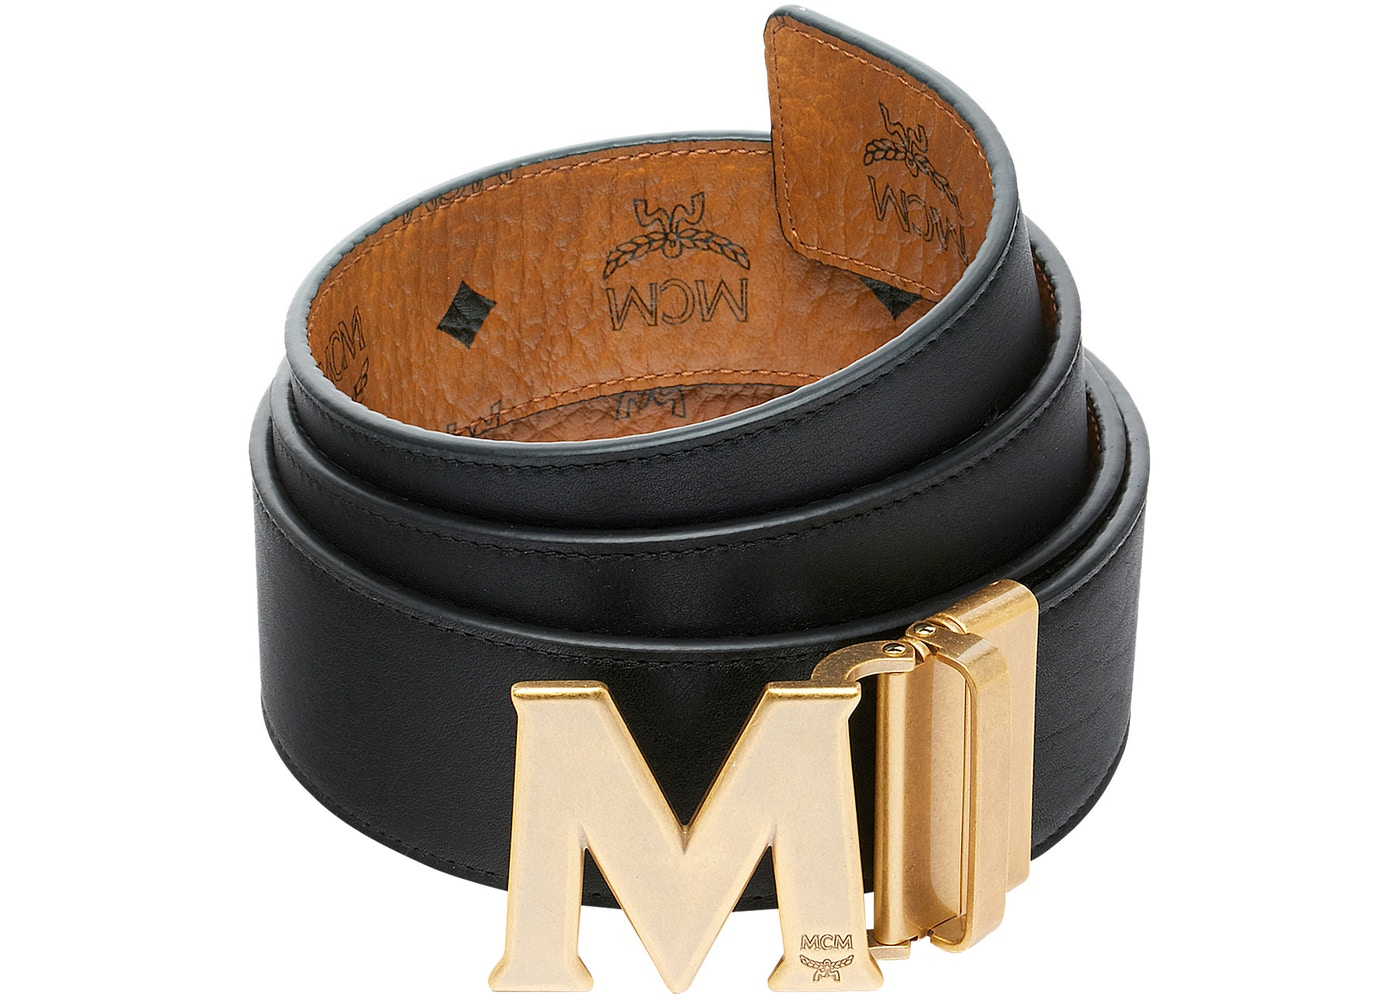 3a19bb9ad25 Buy   Sell Luxury Handbags